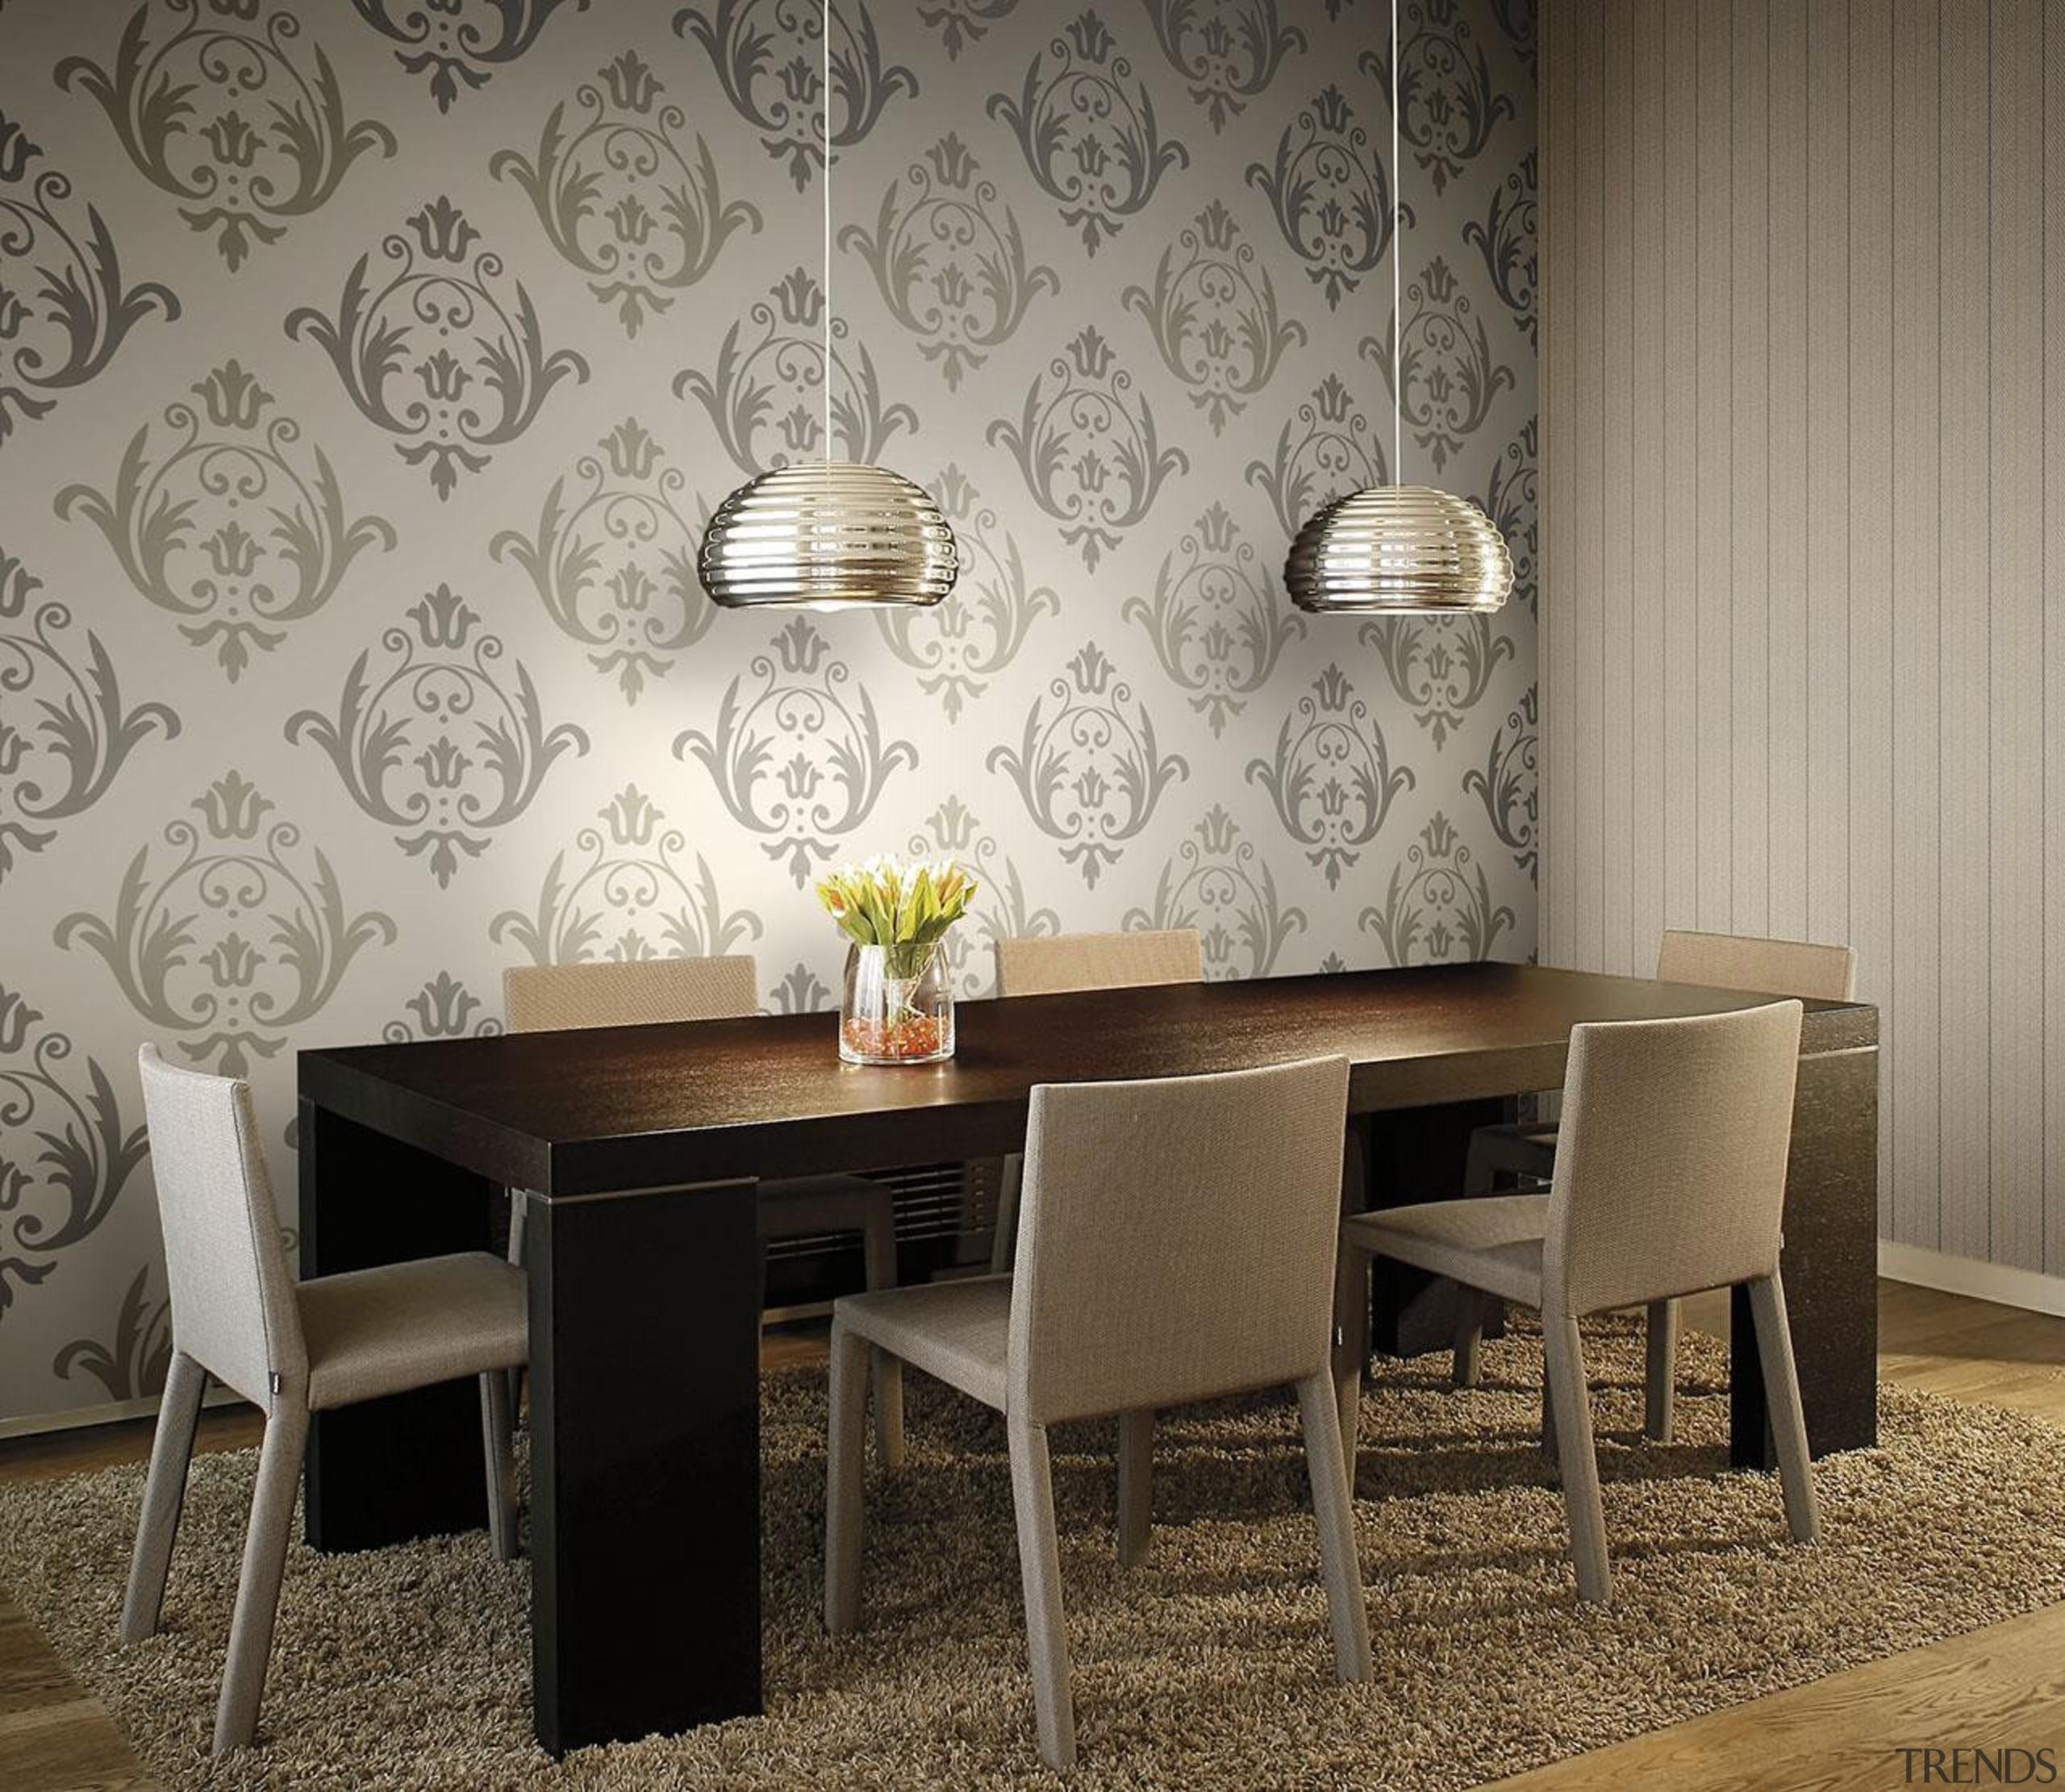 Aurora Range - Aurora Range - ceiling | ceiling, chair, dining room, floor, flooring, furniture, interior design, room, table, wall, wallpaper, gray